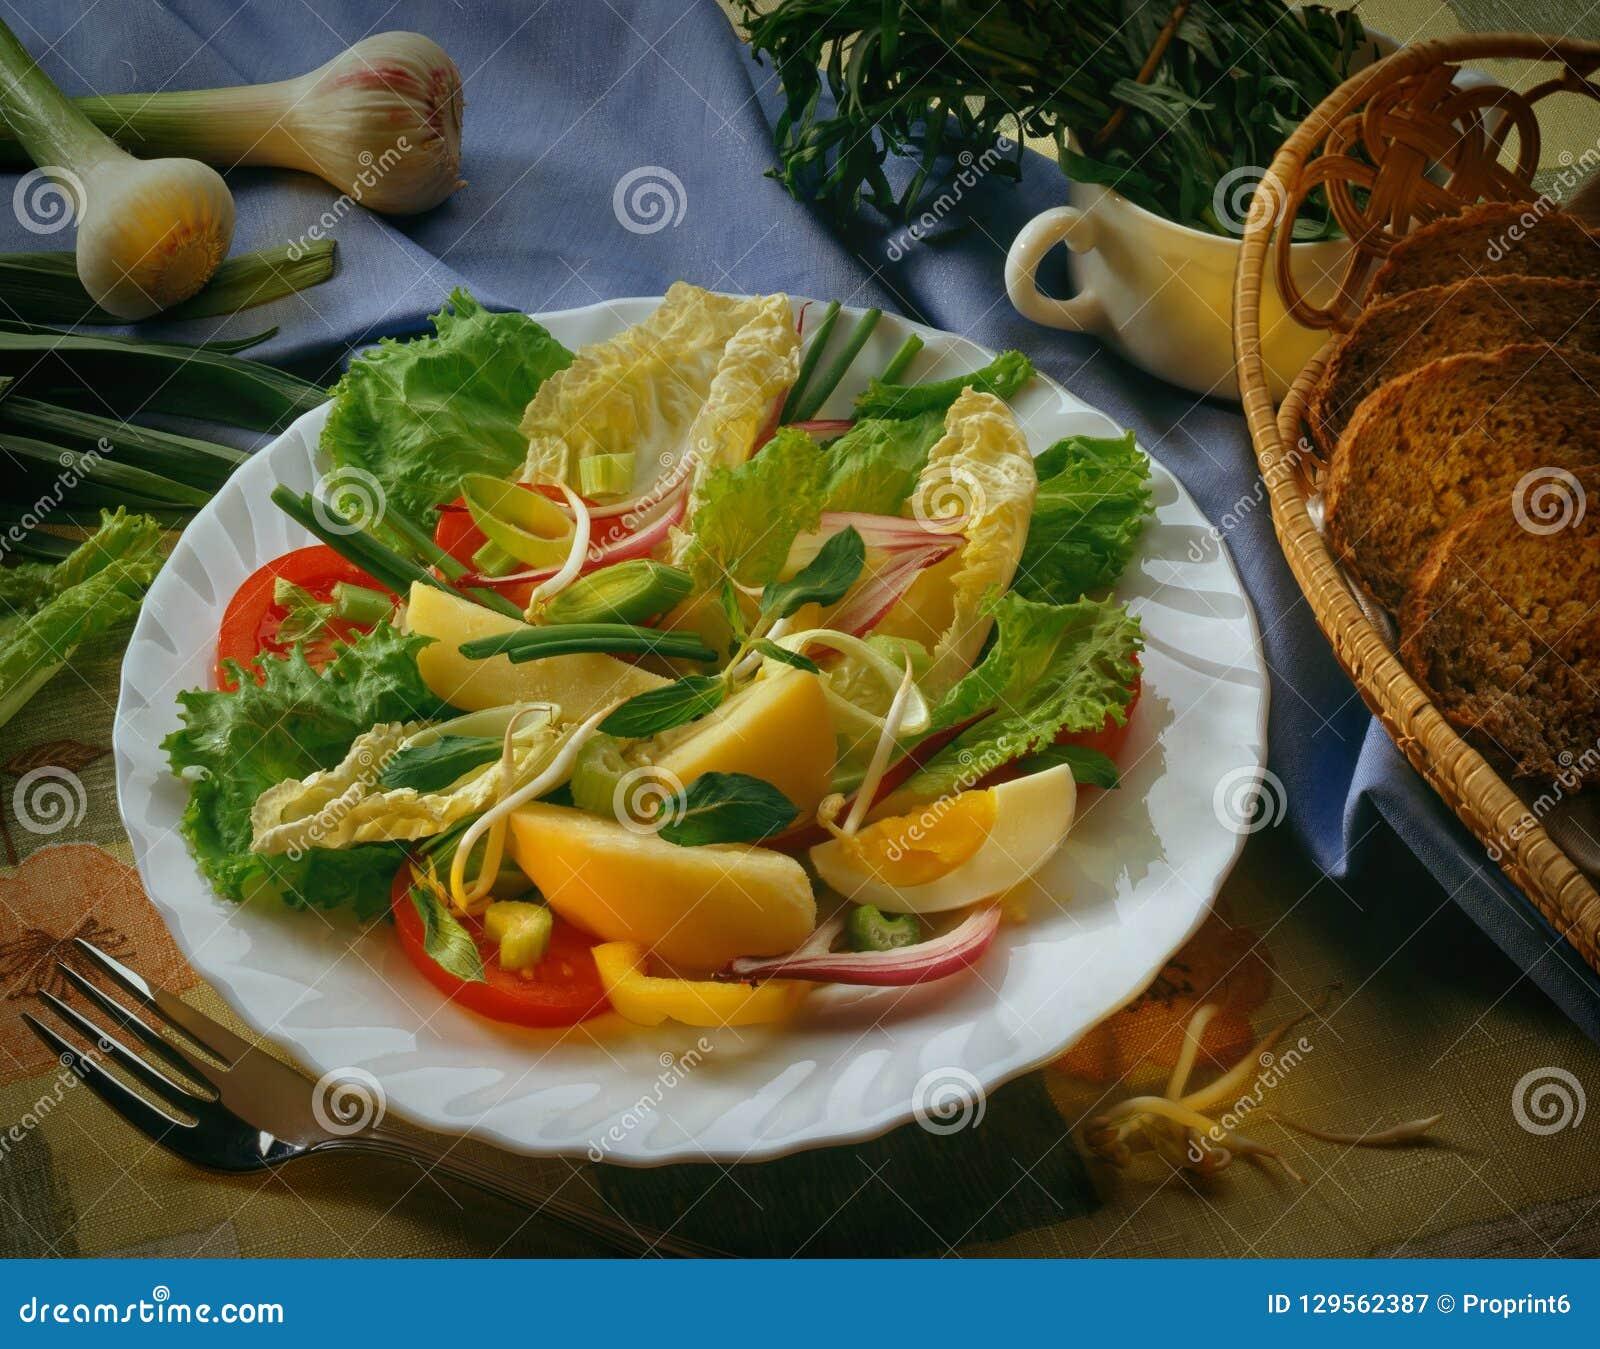 "Ð 'иРDE Ð°Ñ DEL ¡Ð°Ð""· Ensalada vegetal del ¹ del ‰ Ð?Ð del ¾ Ñ del ² Ð del ¾ Ð de Ð"